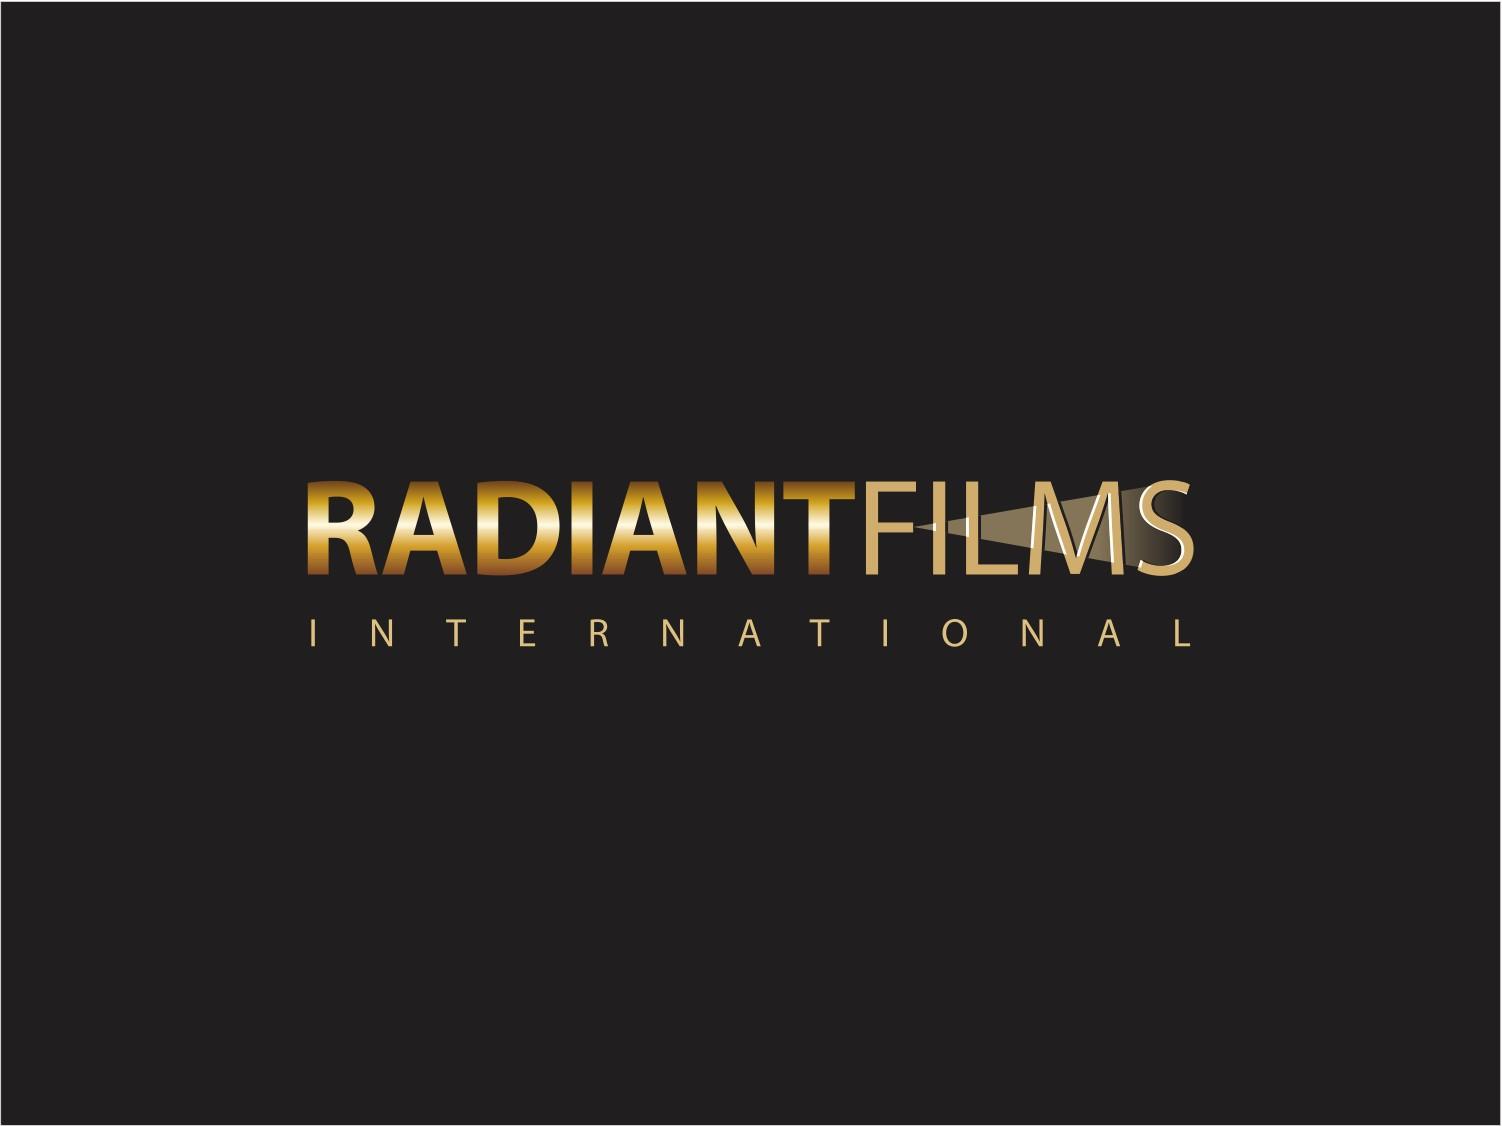 Radiant Films International needs a new logo